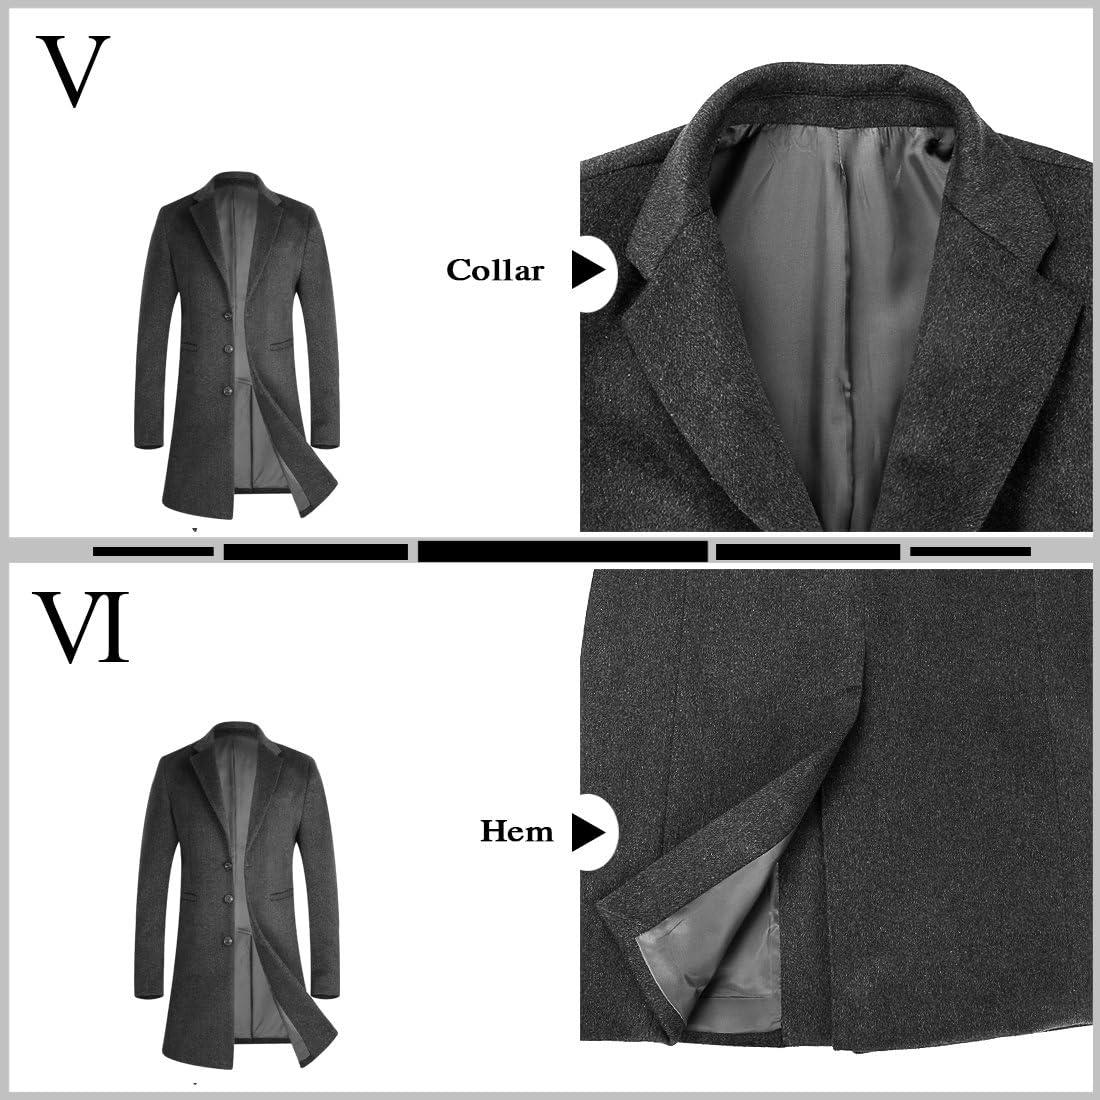 APTRO Mens Trench Wool Coat Long Gentleman Business Black Top Coat 01 Grey, Medium